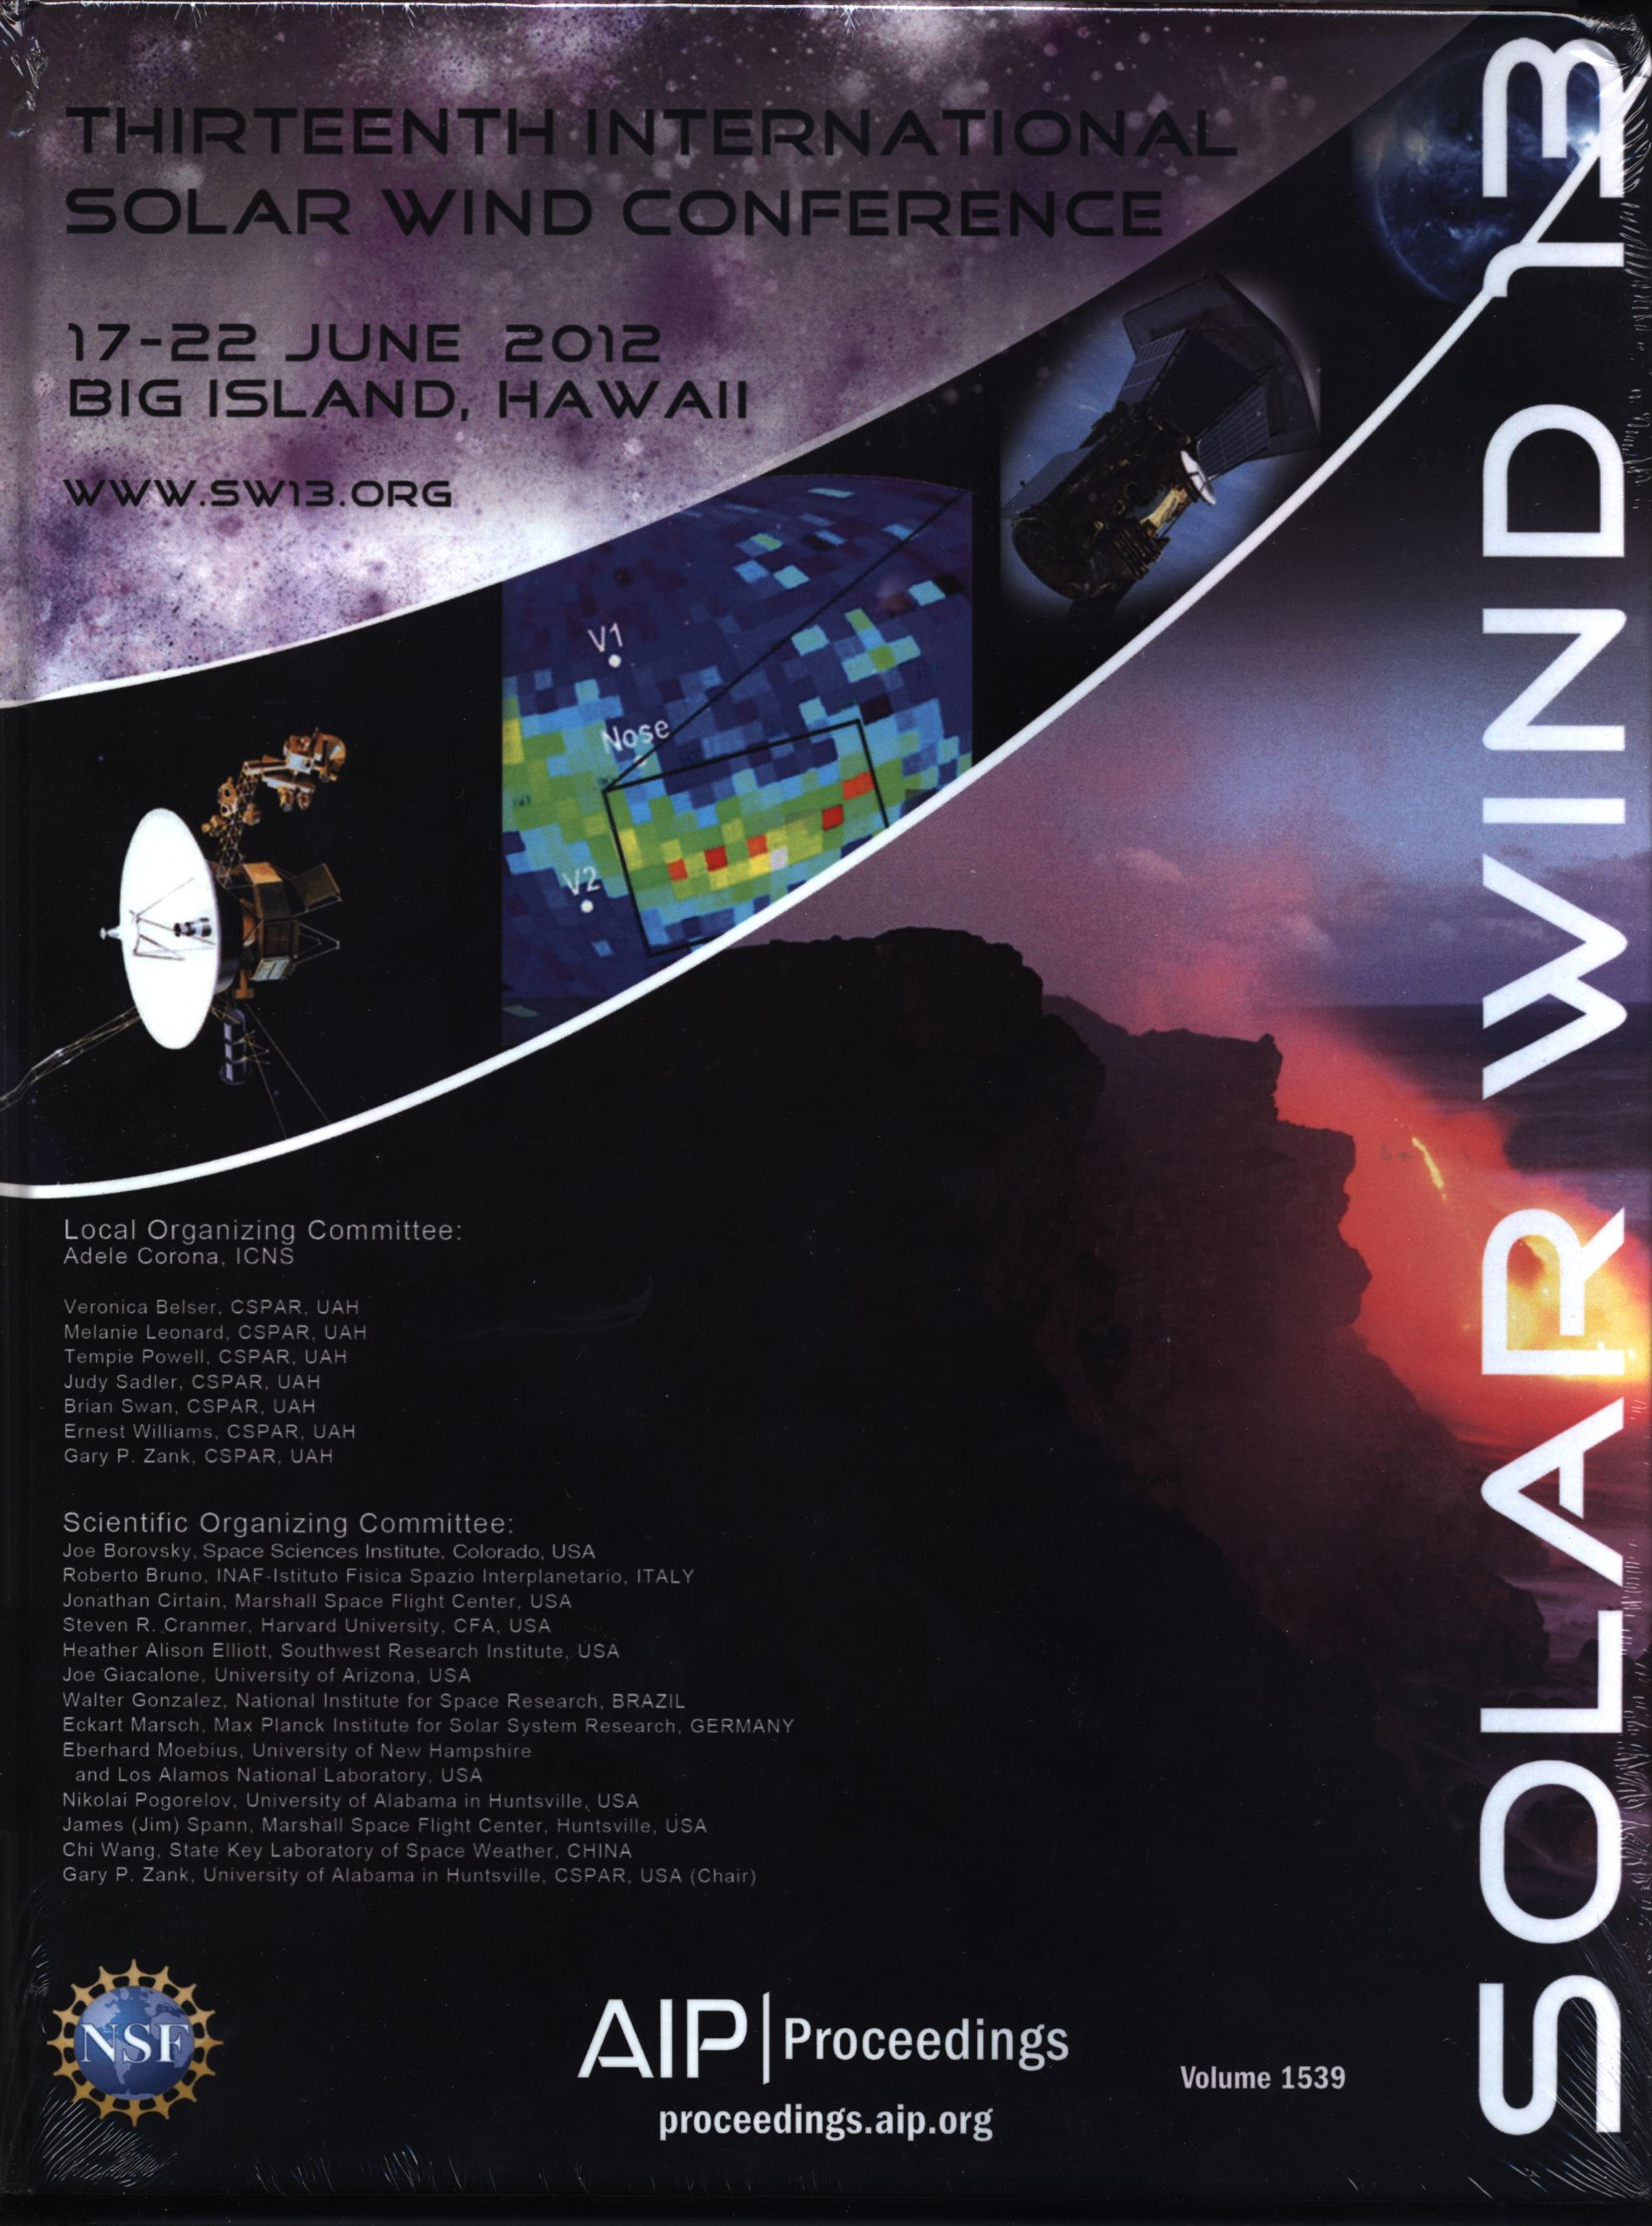 SOLAR WIND 13: Proceedings of the Thirteenth International